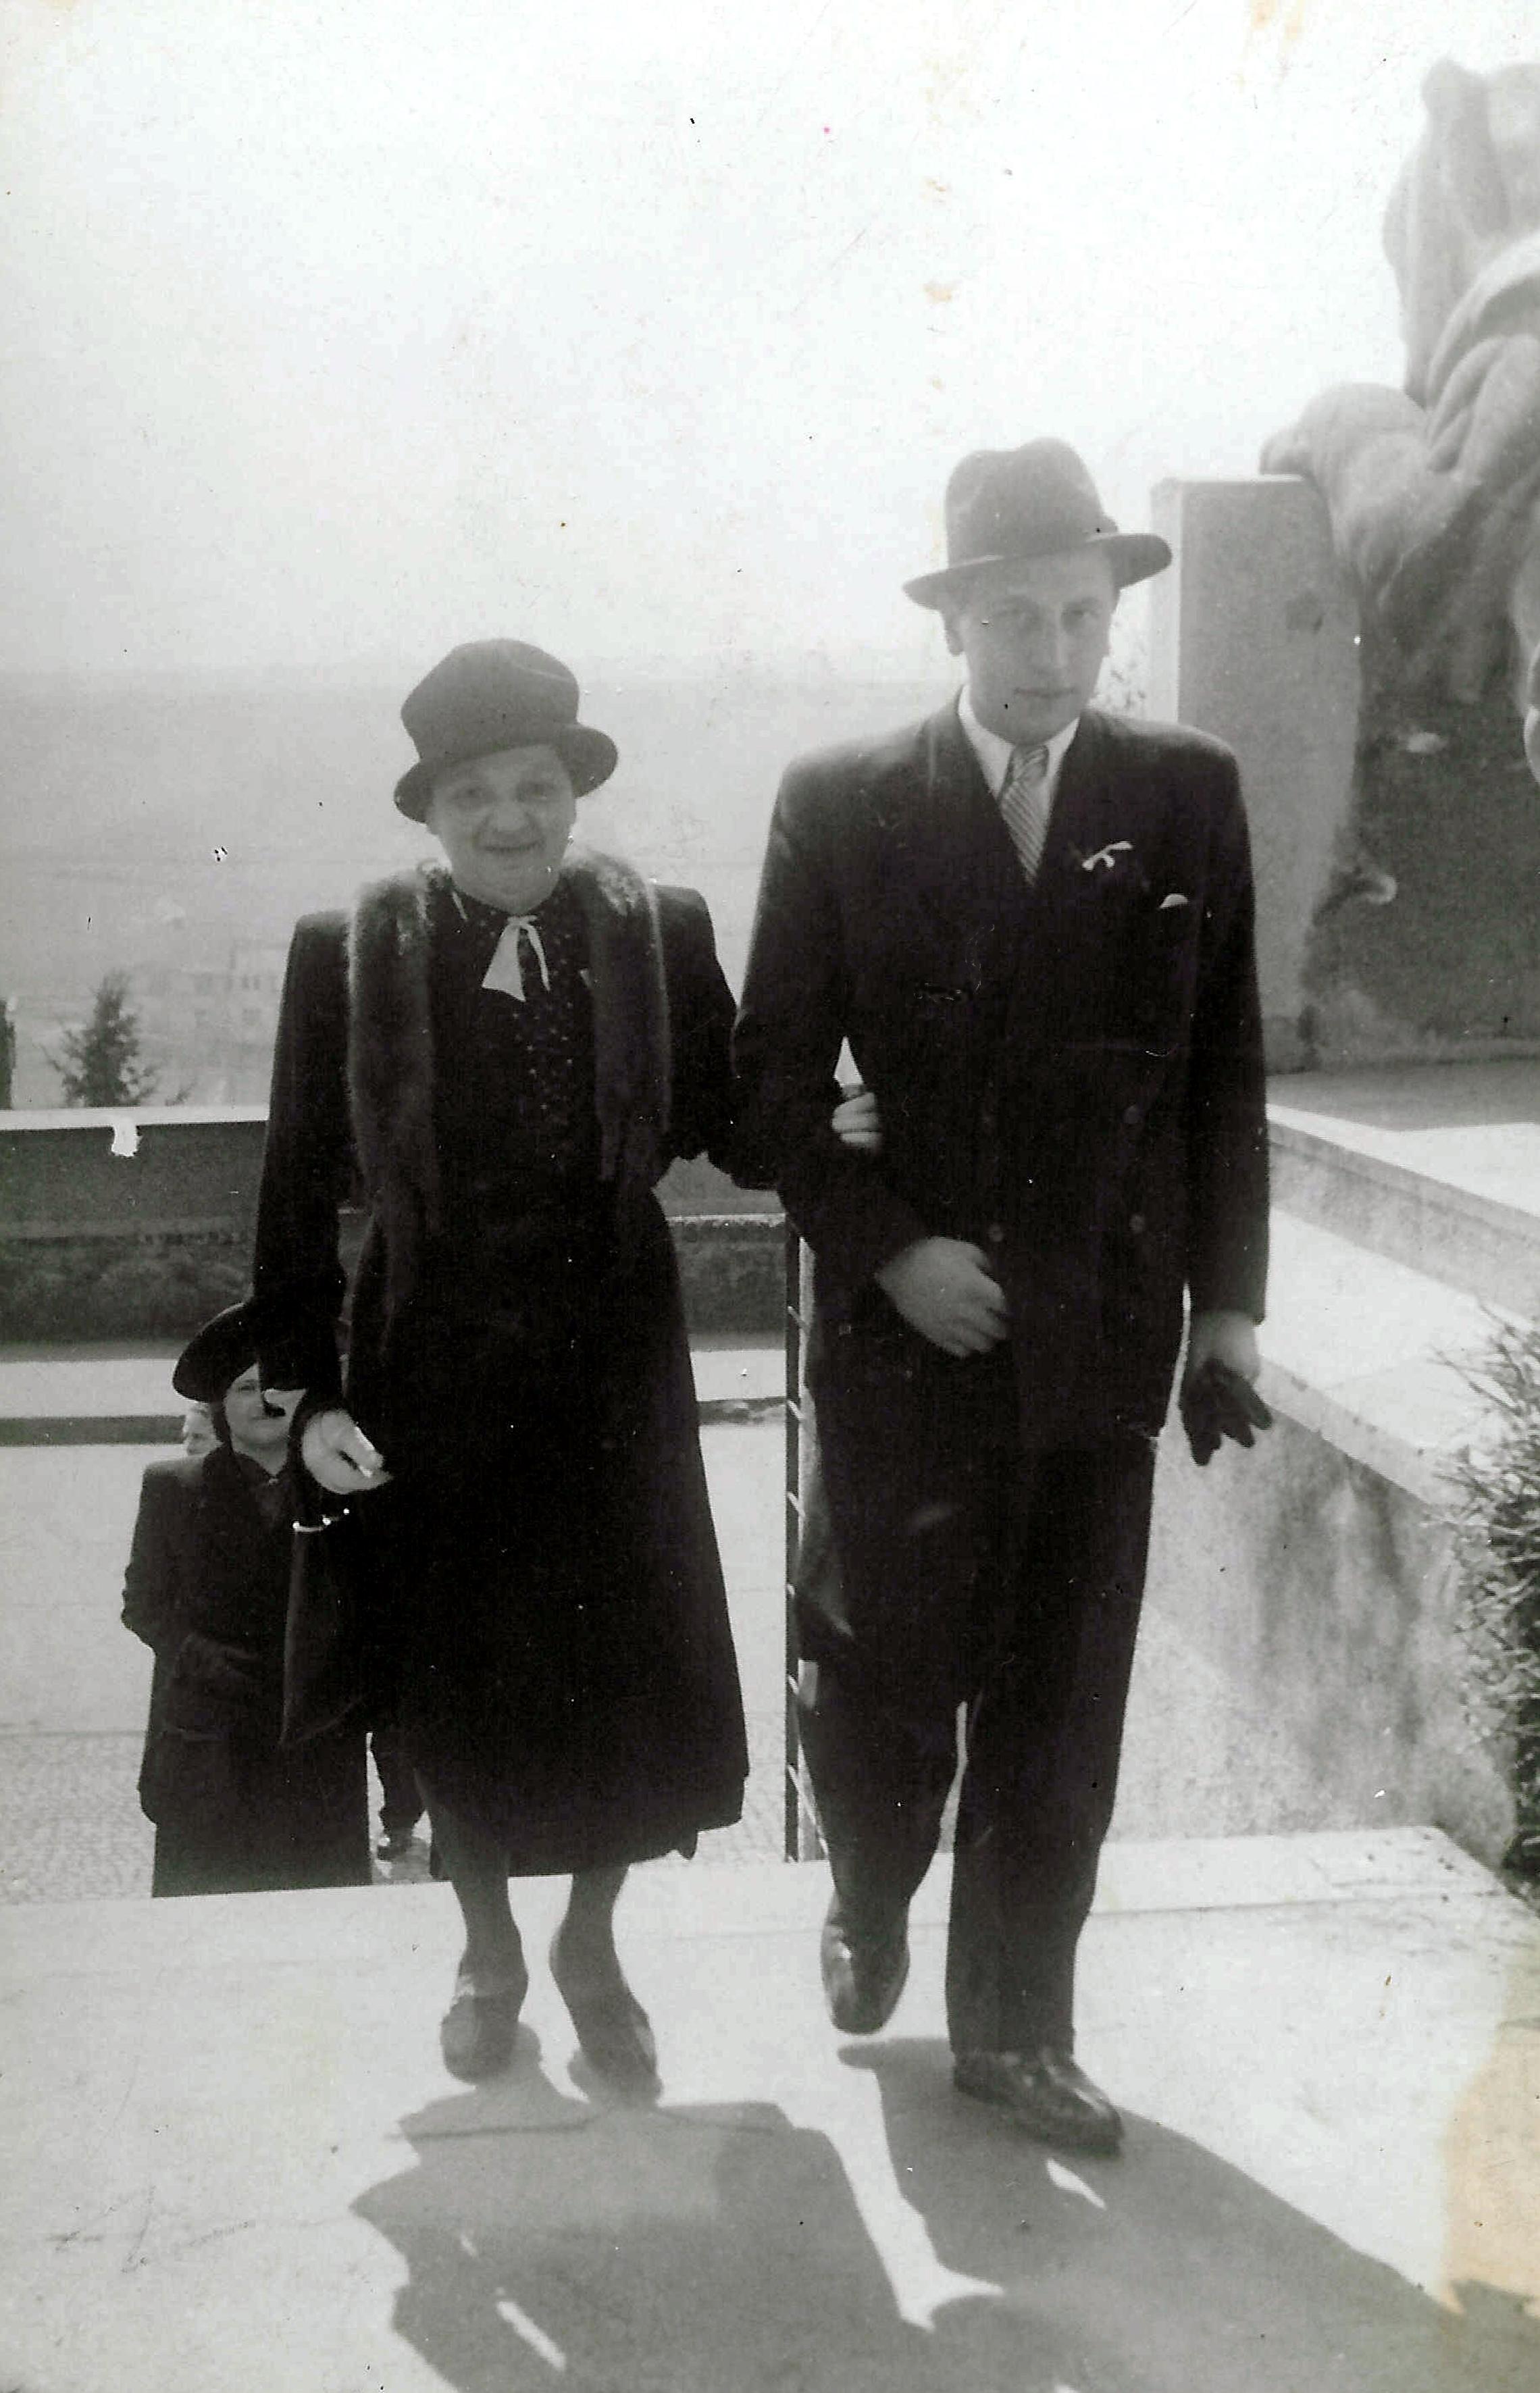 Eva Meislova's husband Jiri Meisl and her mother Stepanka Bohmova